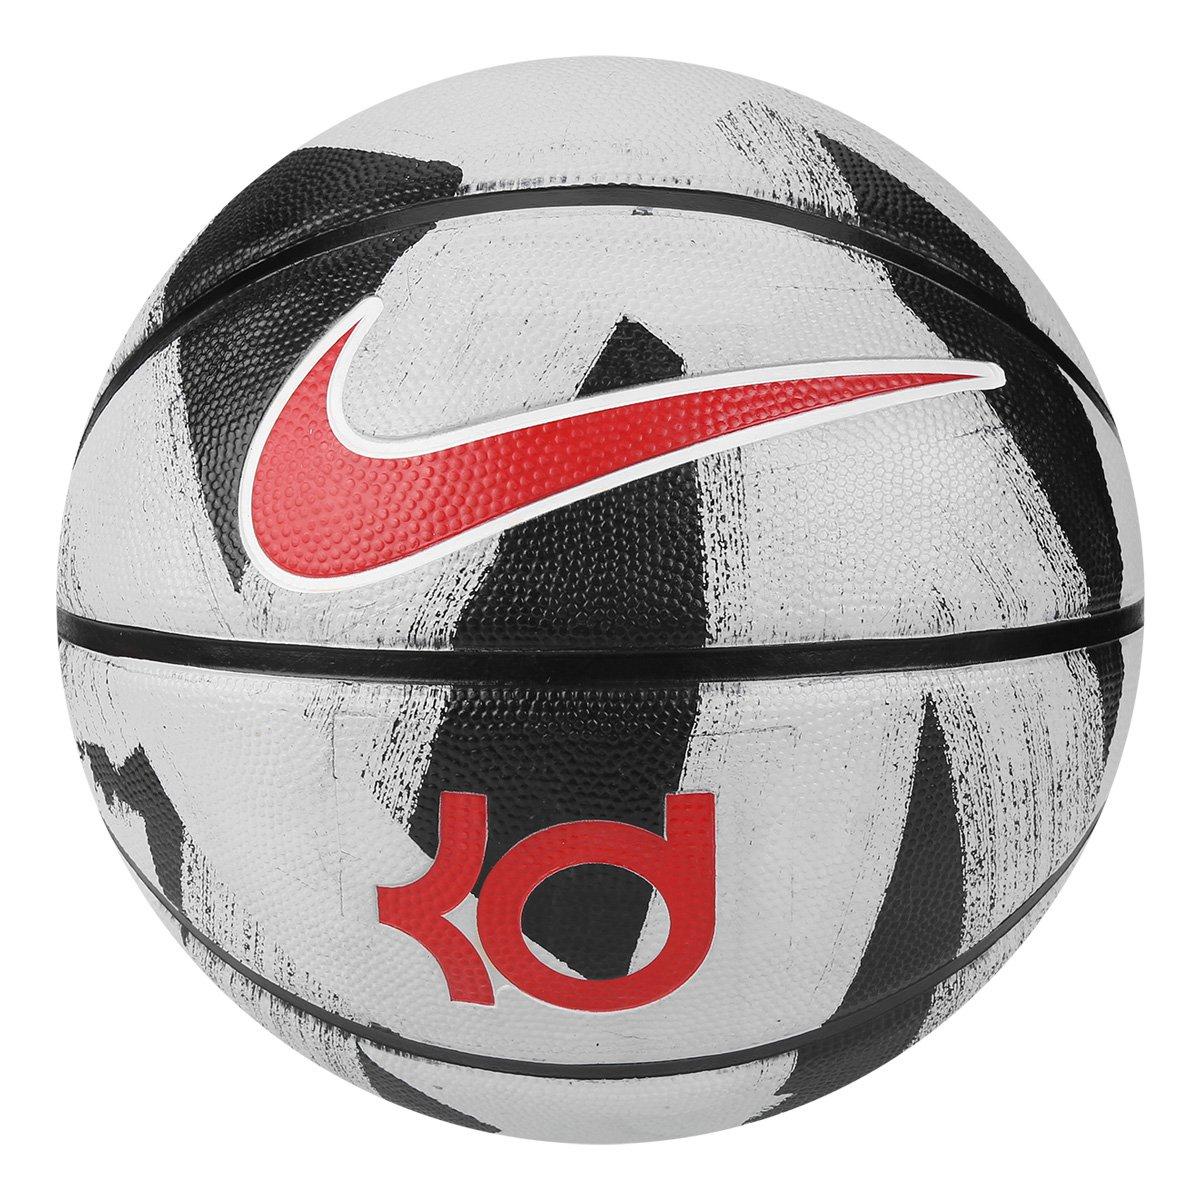 72dcdeb8ea Bola Basquete Nike KD Playground 8P Tam 7